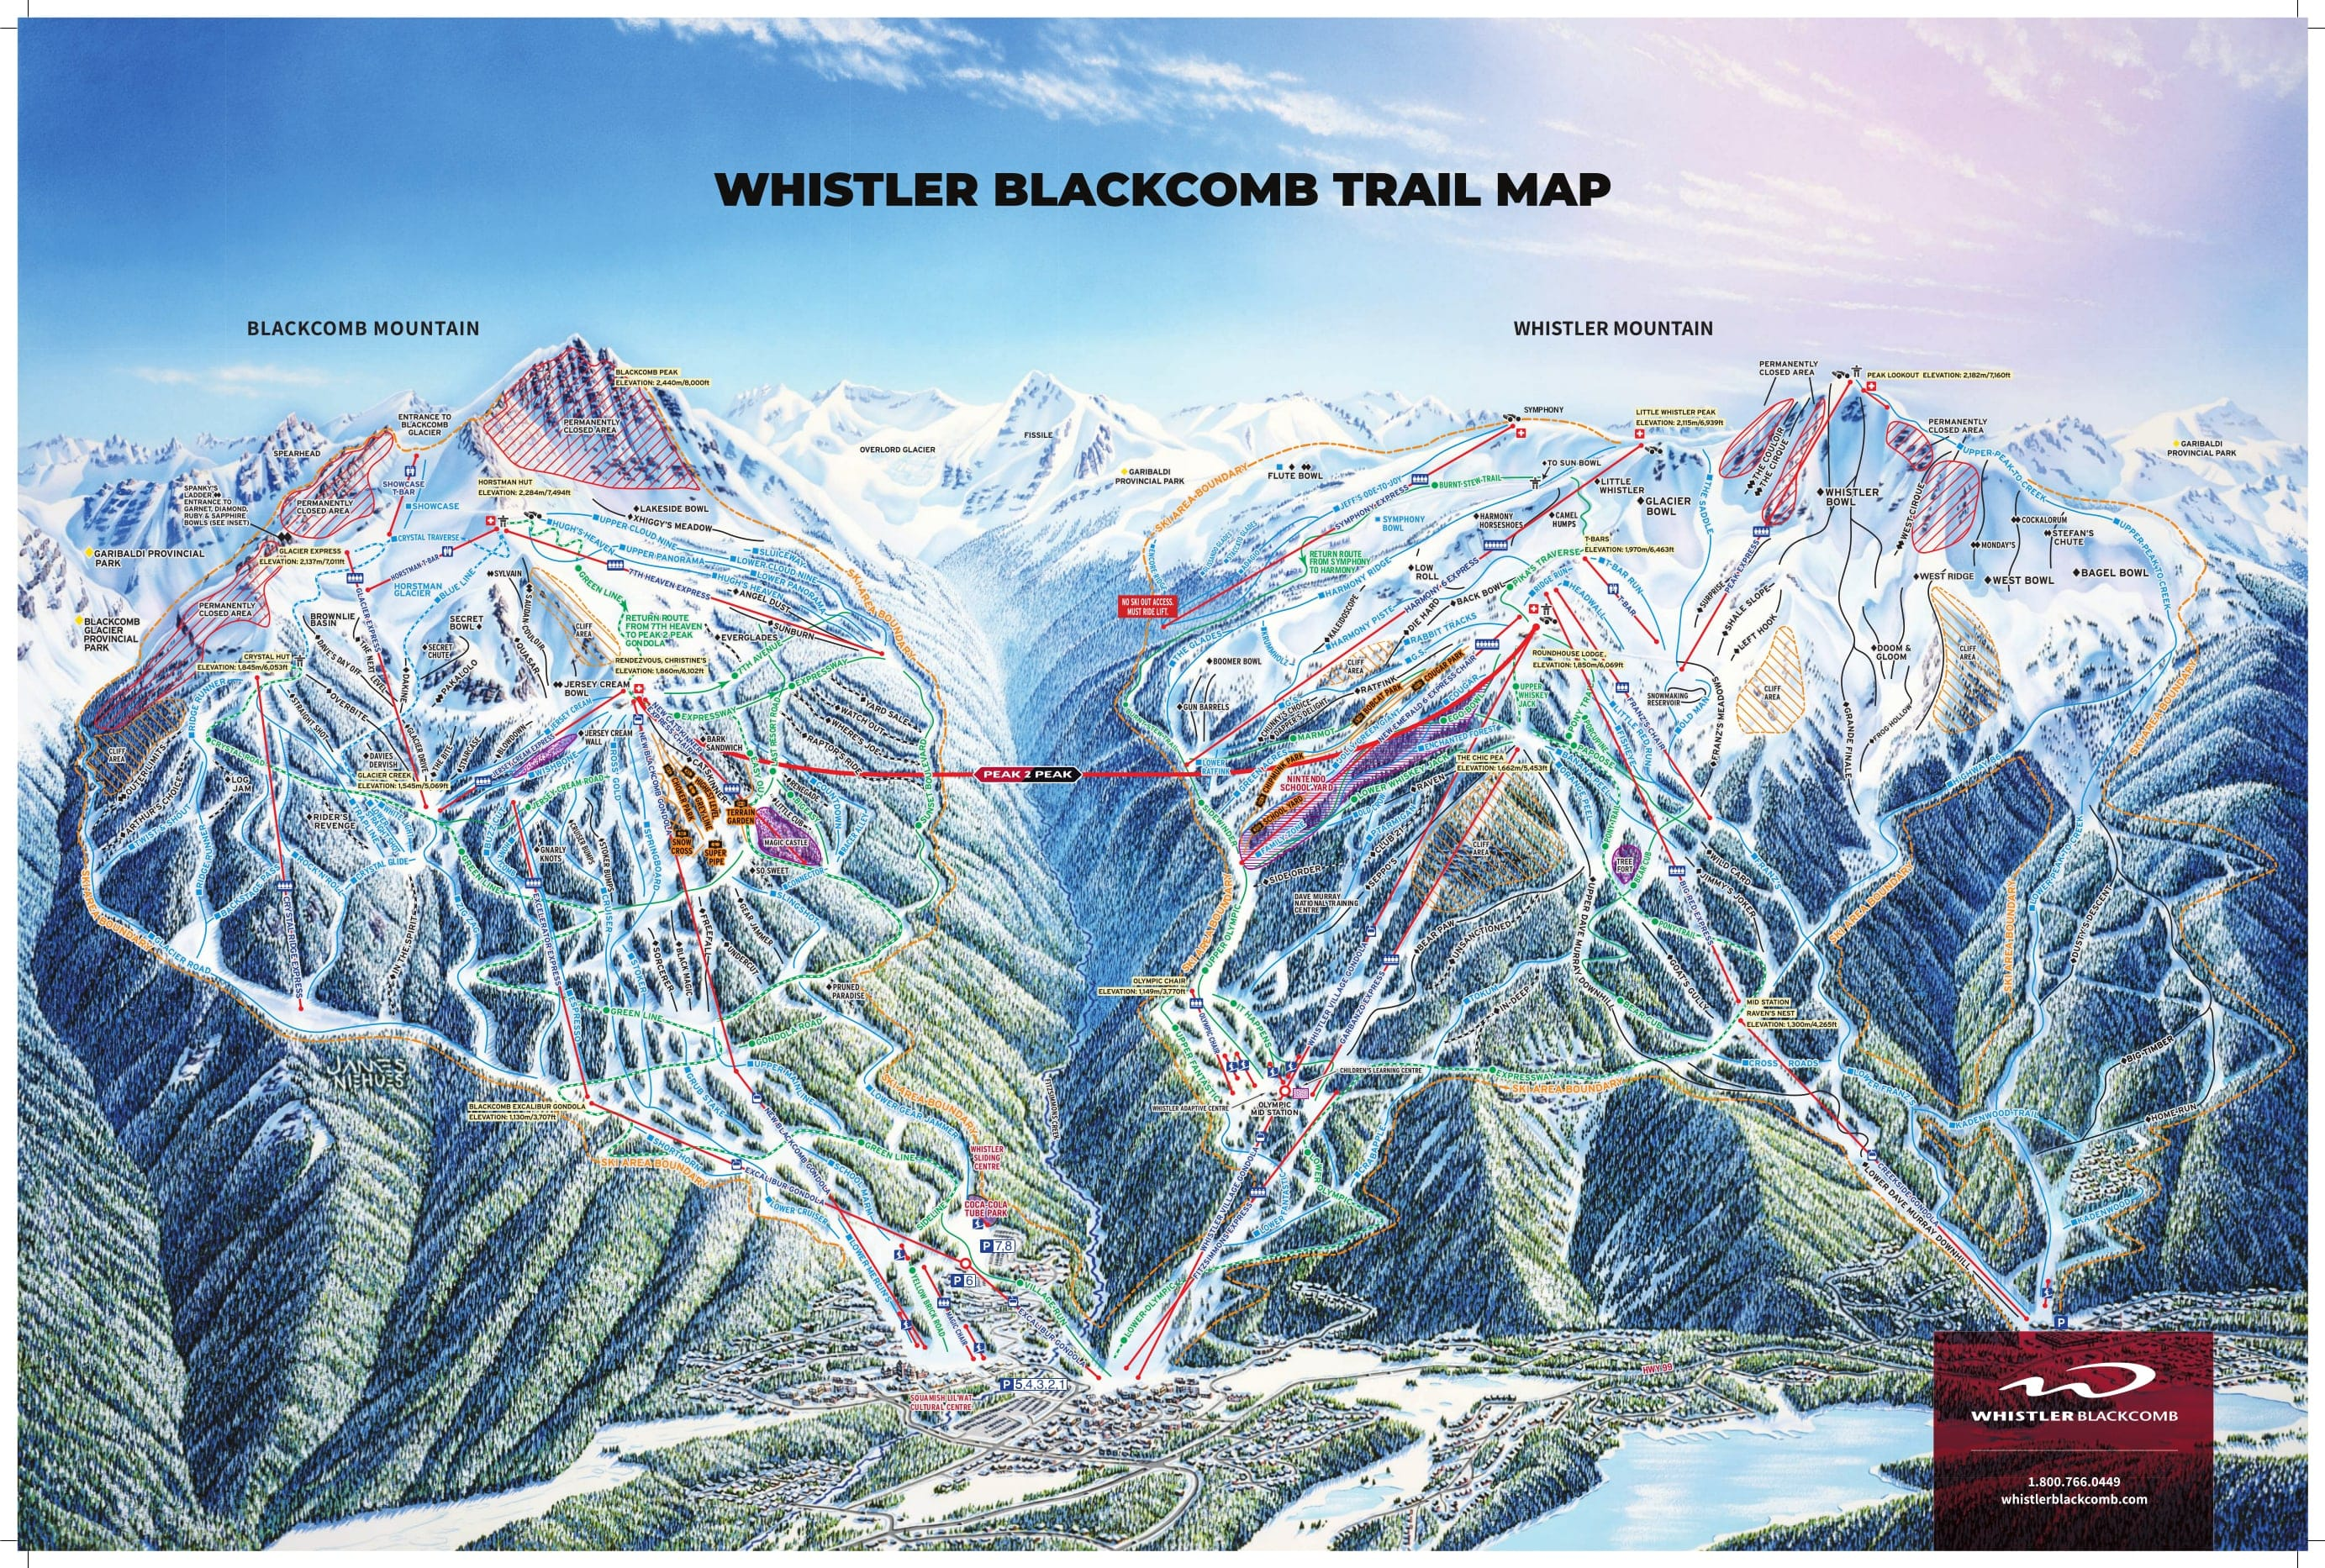 Whistler Canada Ski Map Whistler Blackcomb Ski Resort Piste Maps